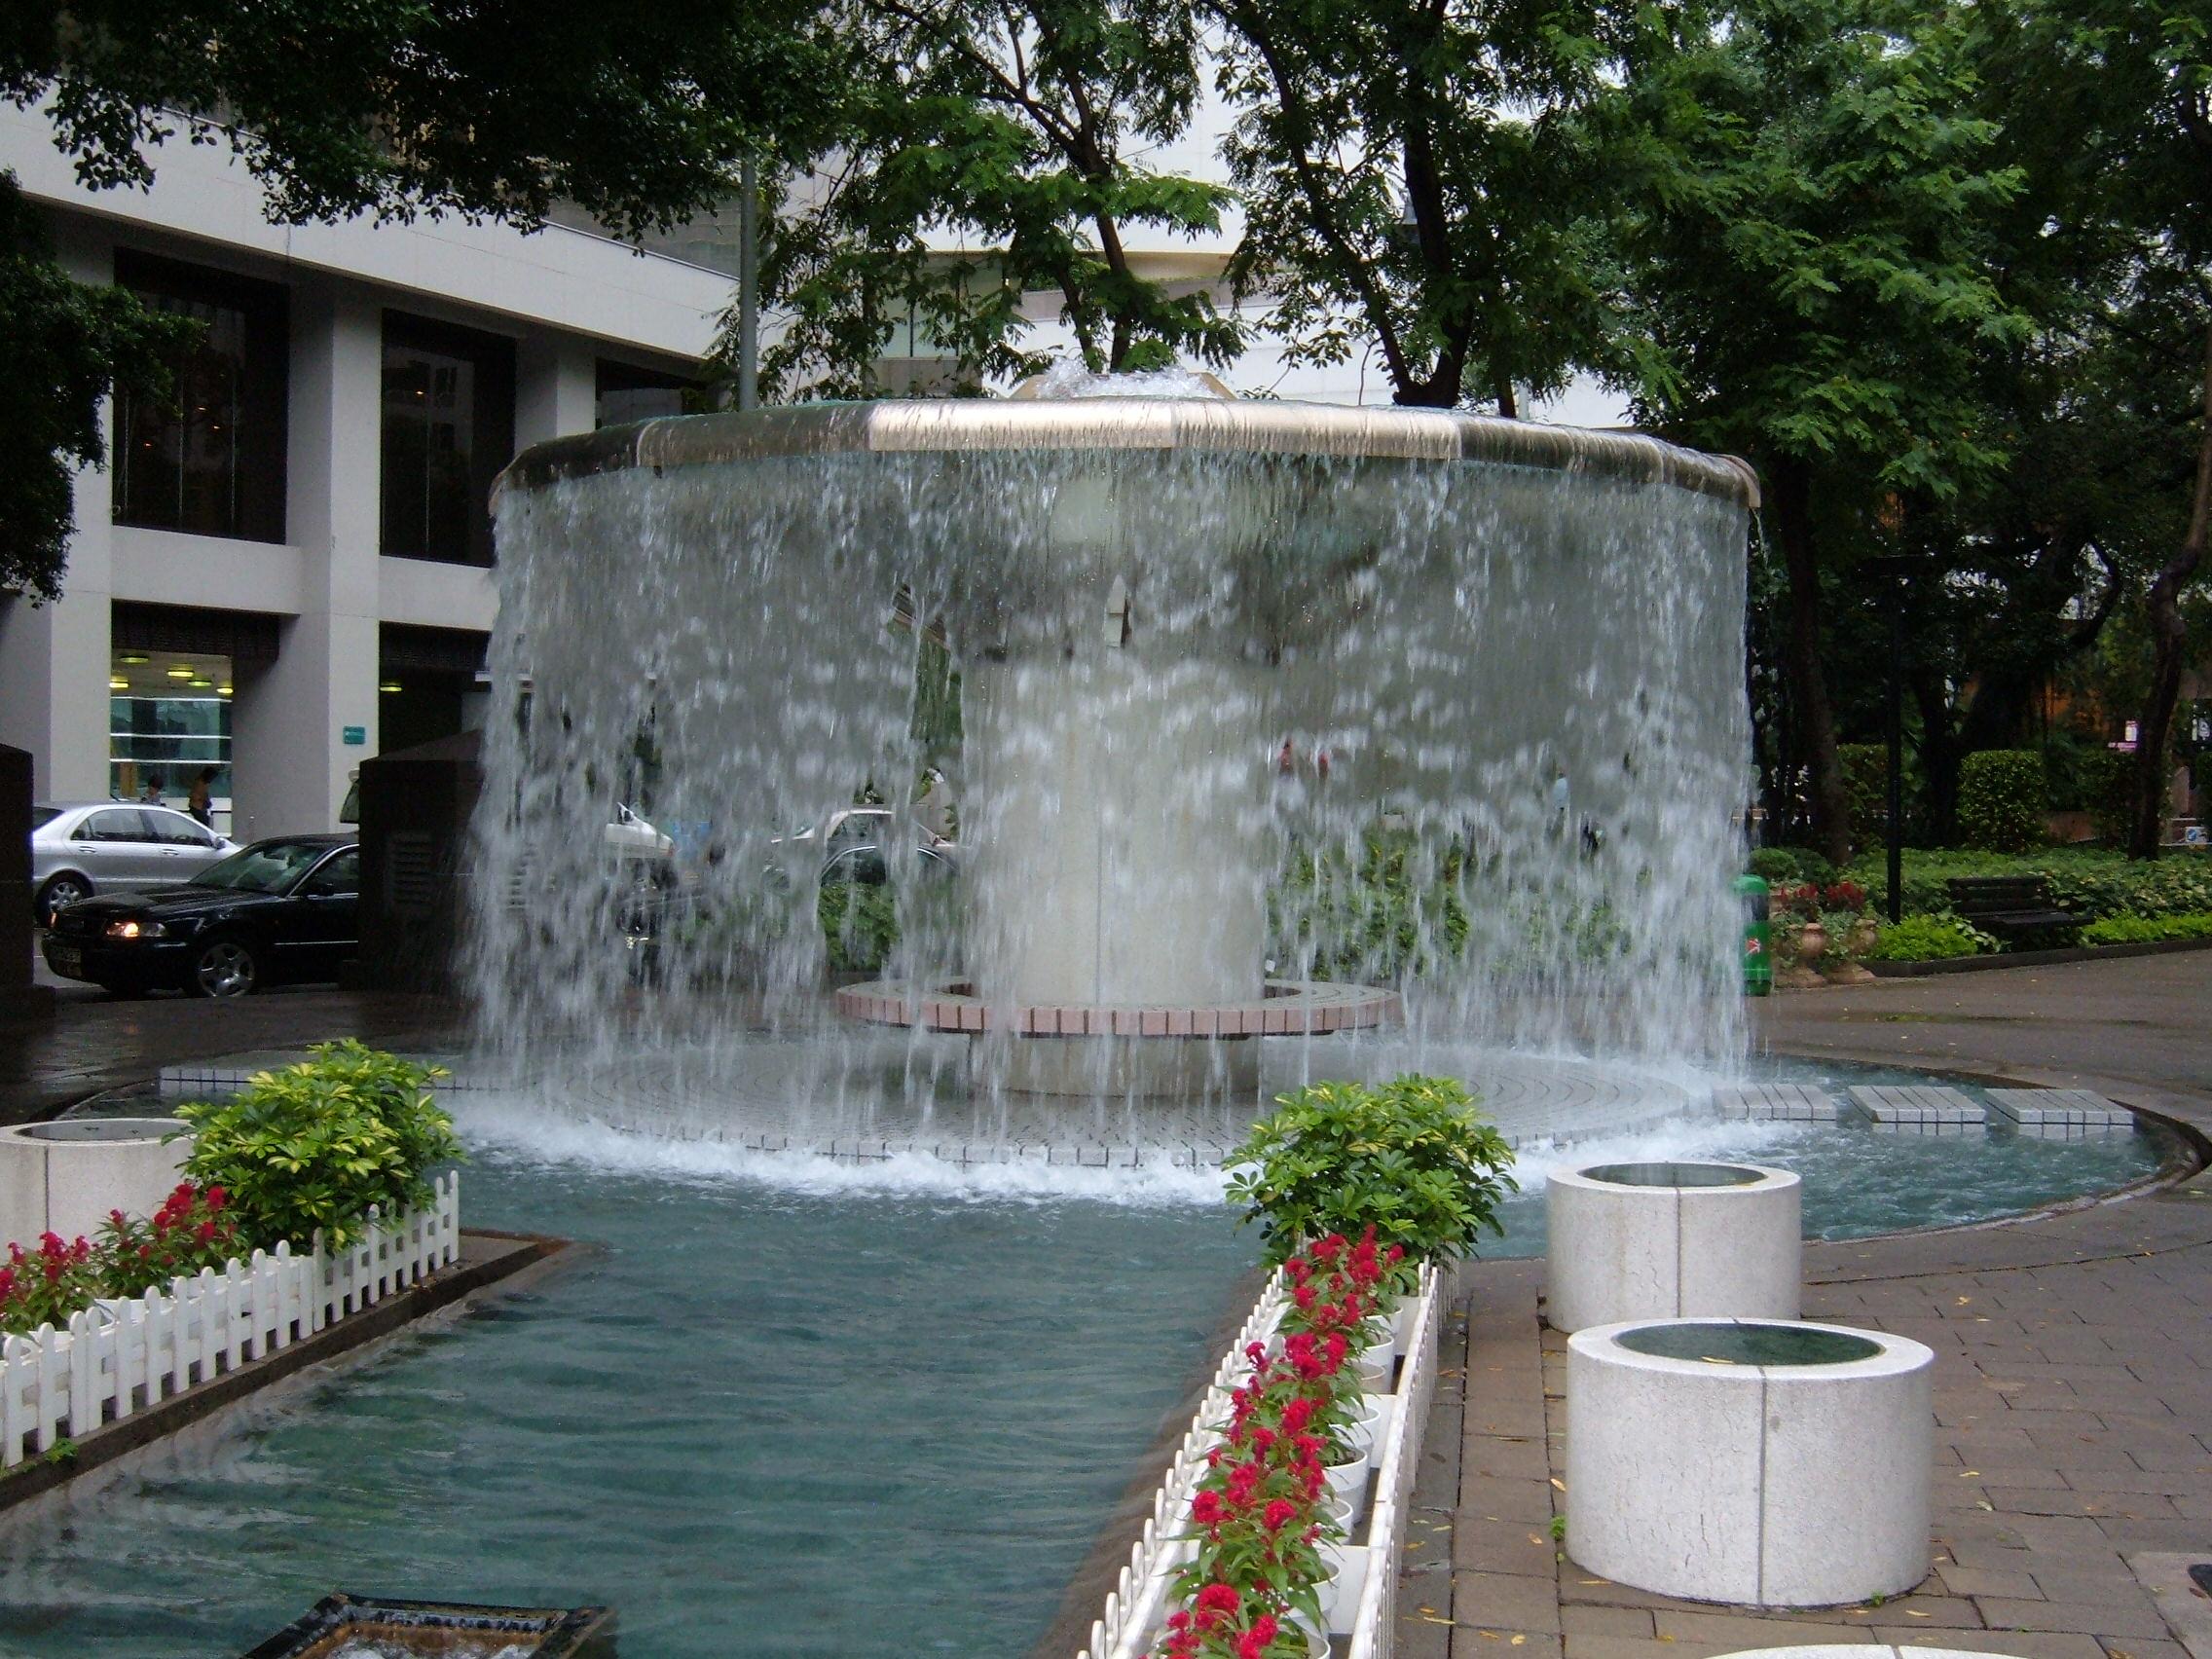 Hong_Kong_Park_large_fountain.JPG